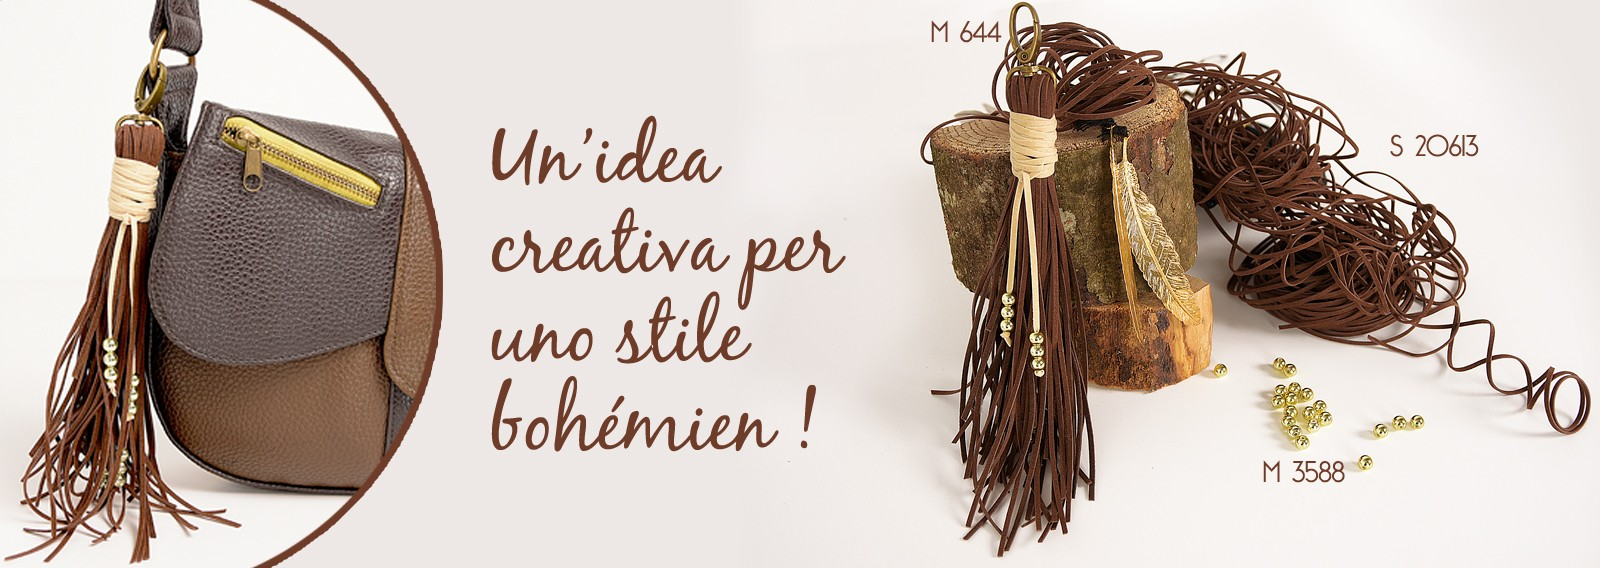 Un'idea creativa per uno stile bohémien !